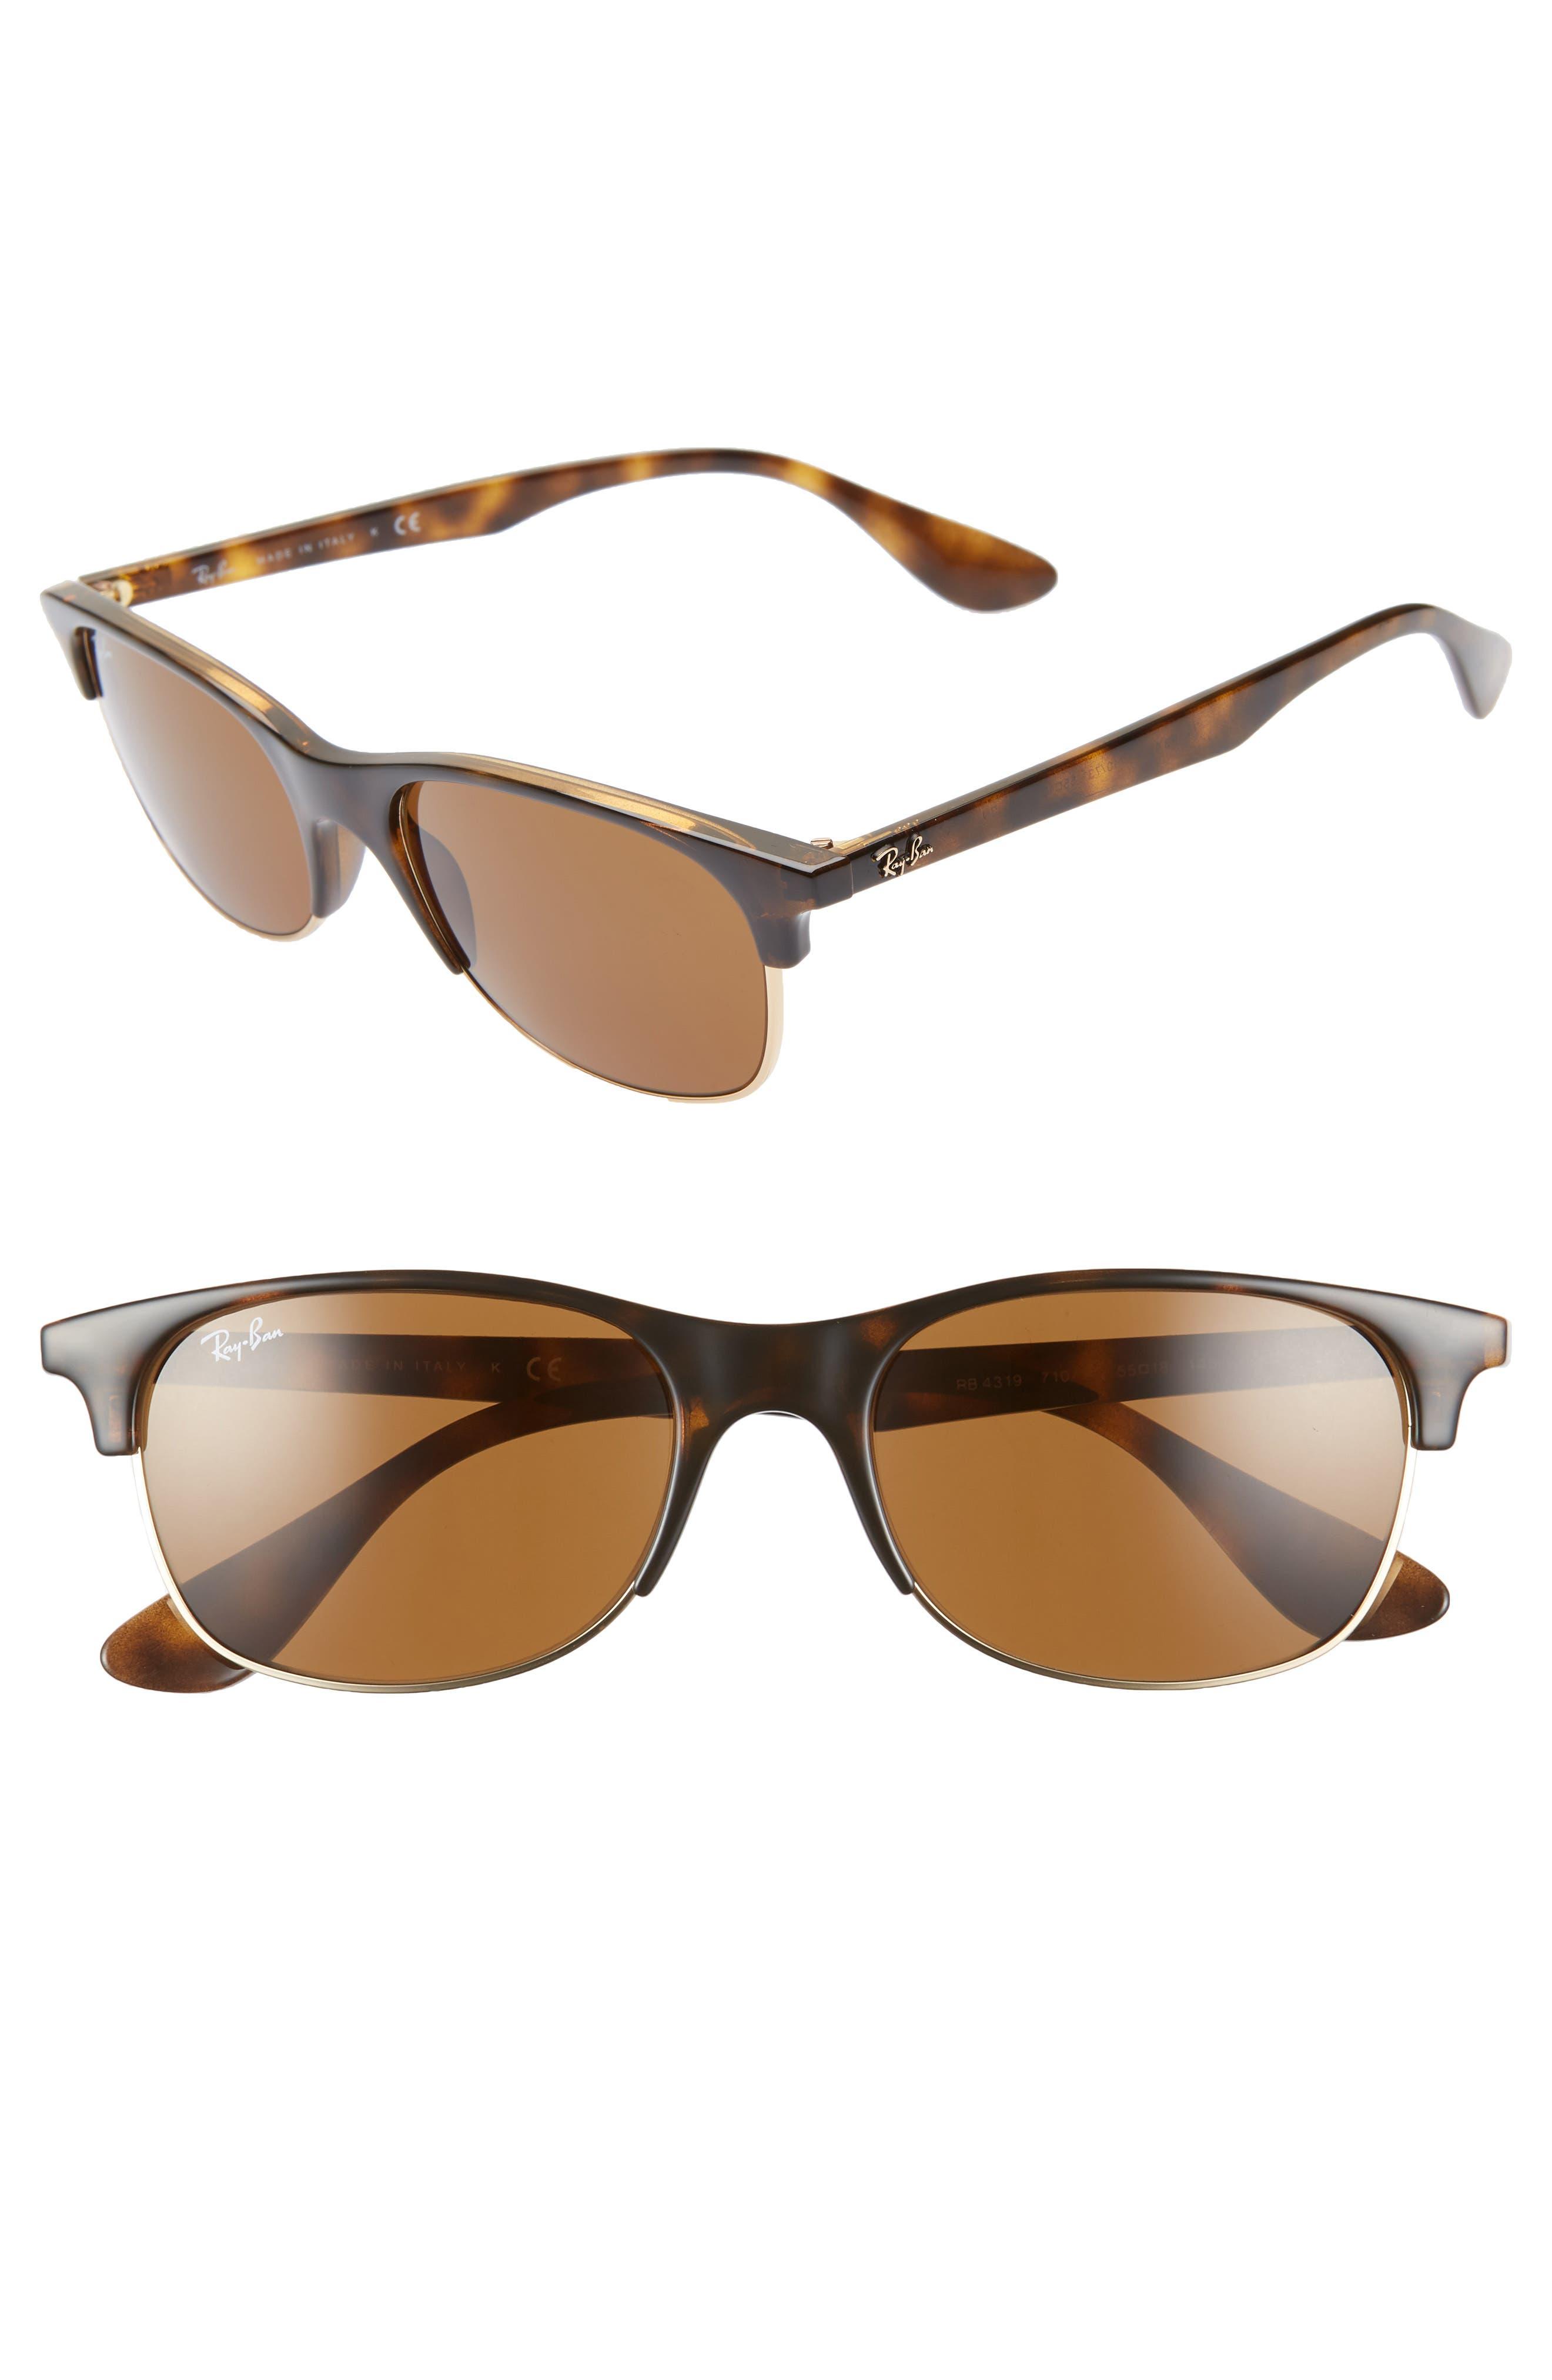 Ray-Ban 55Mm Sunglasses - Havana/ Havana Solid